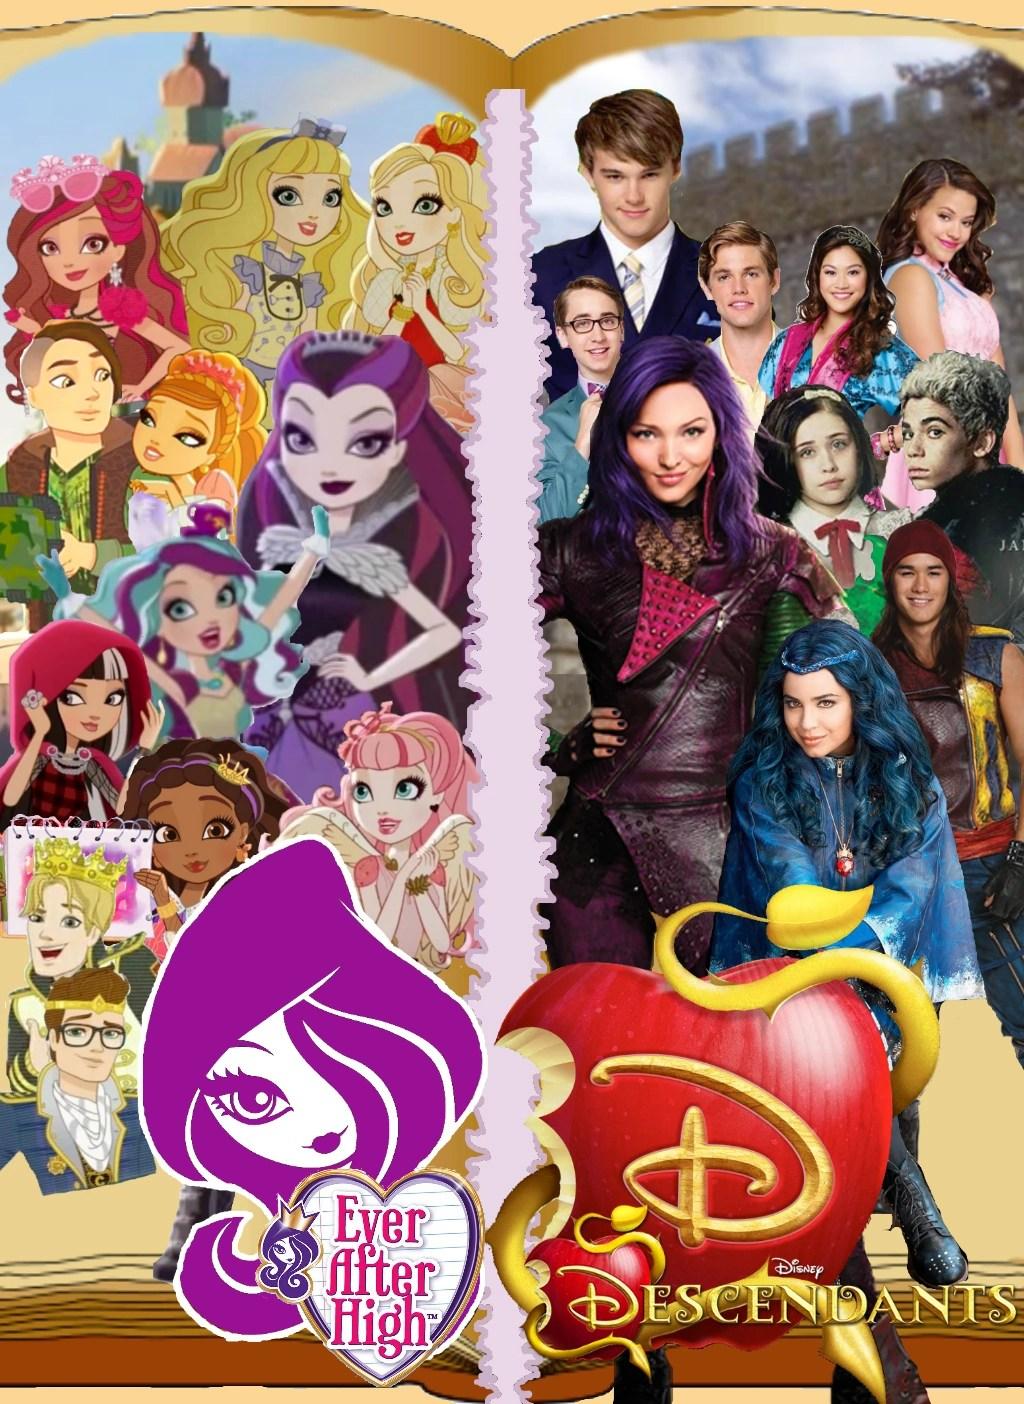 Disney Descendants Doug